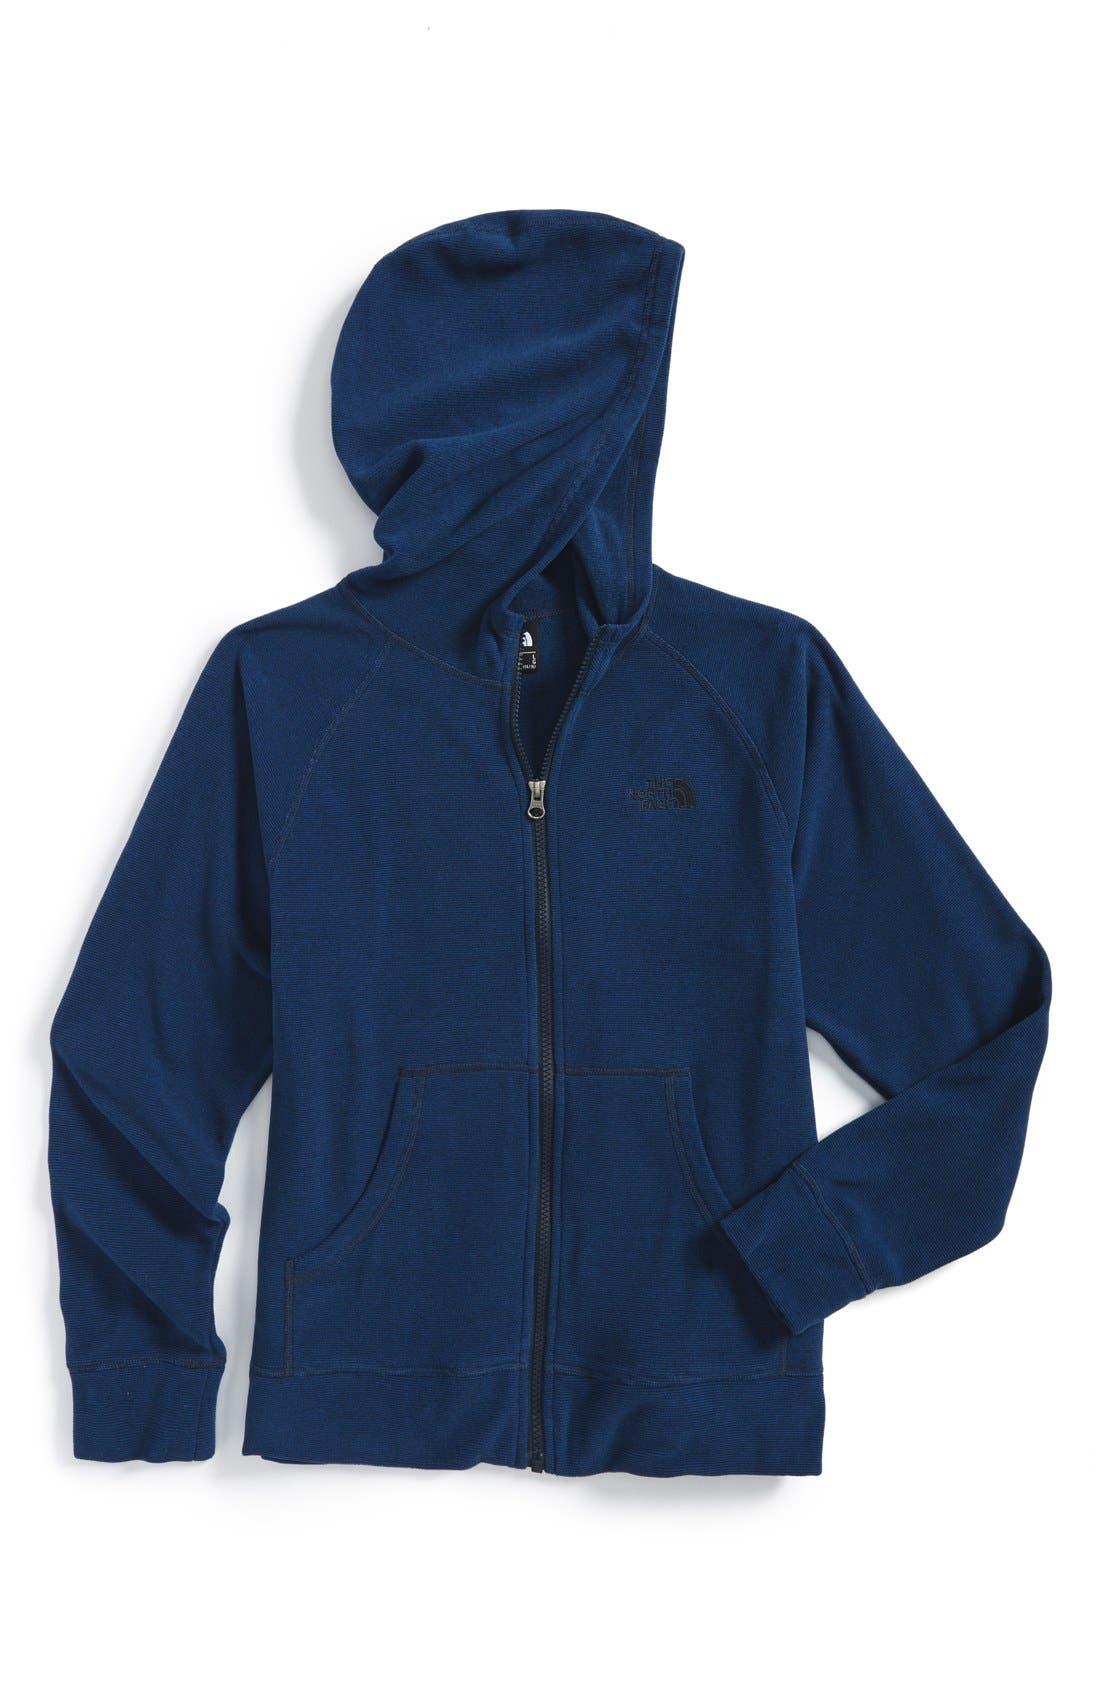 Main Image - The North Face 'Glacier' Fleece Hoodie (Toddler Boys, Little Boys & Big Boys) (Regular Retail Price: $50.00)